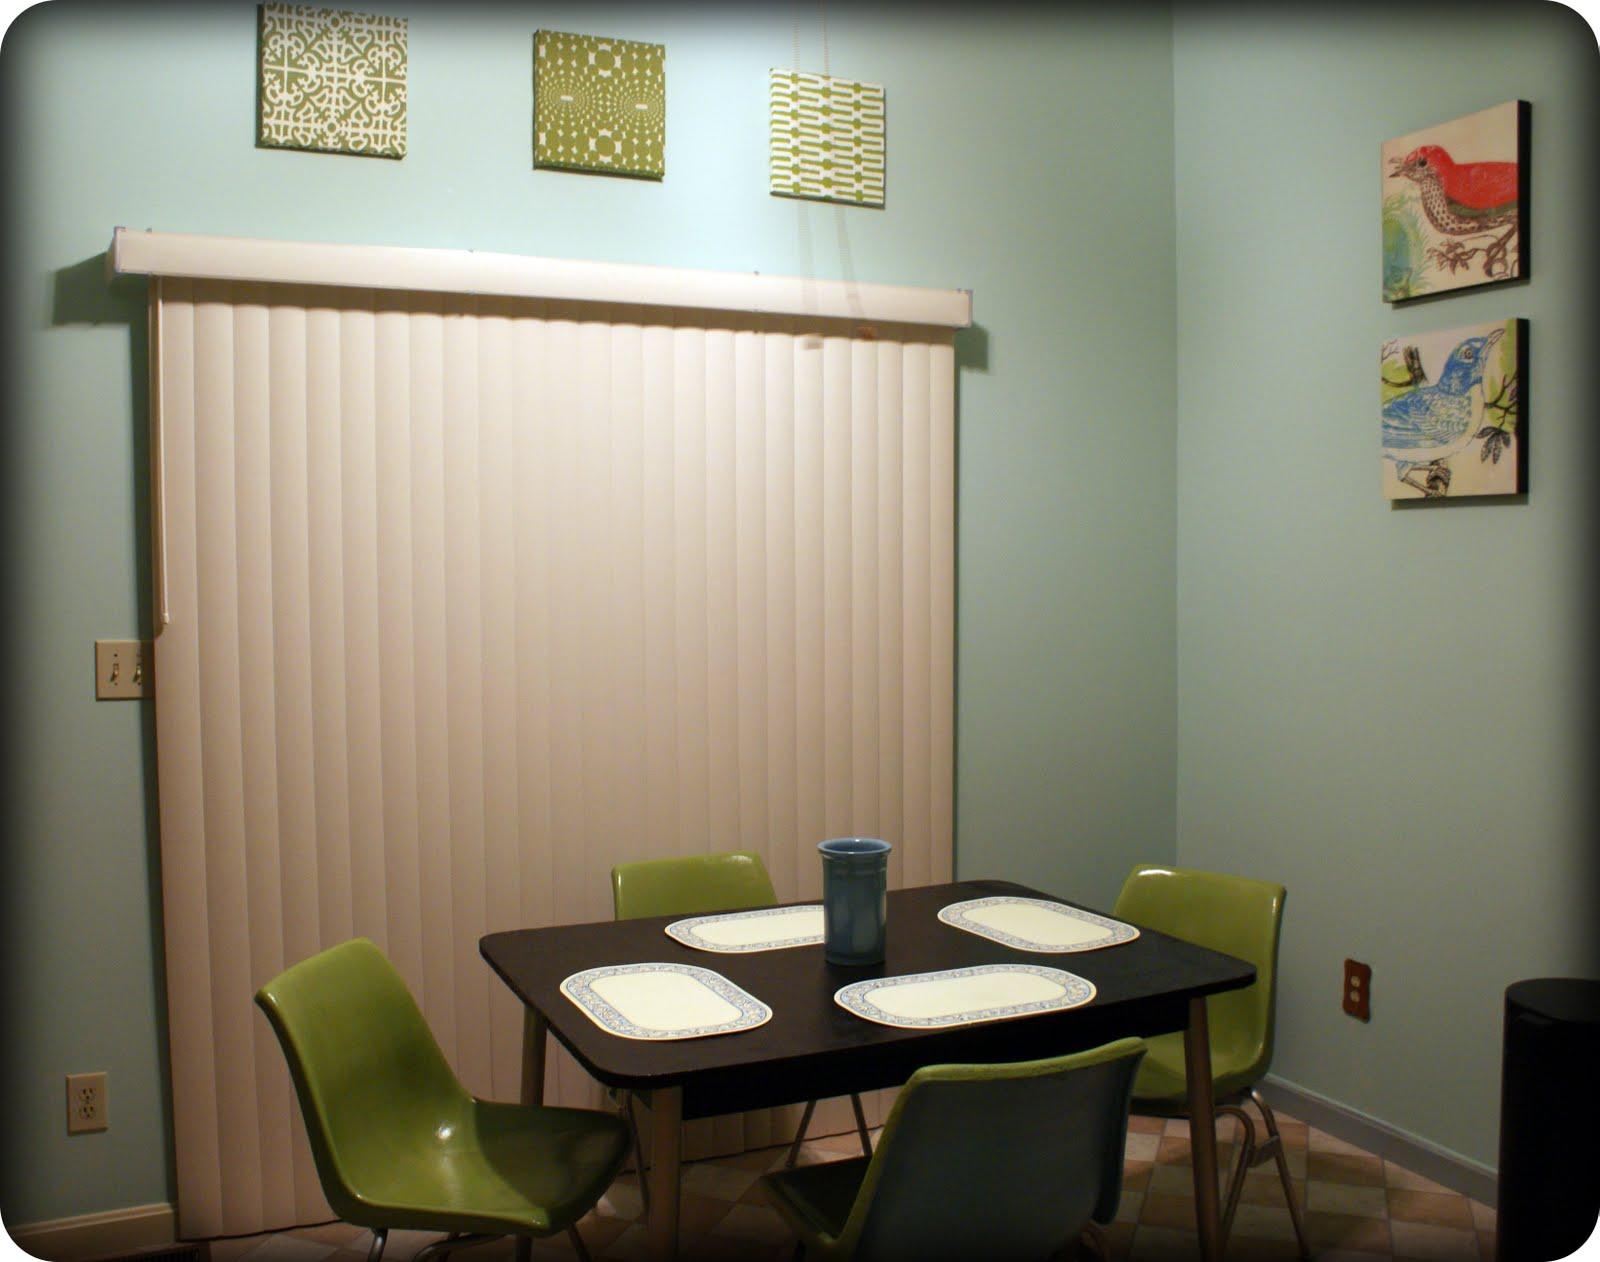 Fabric Wall Kitchen : Fabric wall art diy my retro kitchen